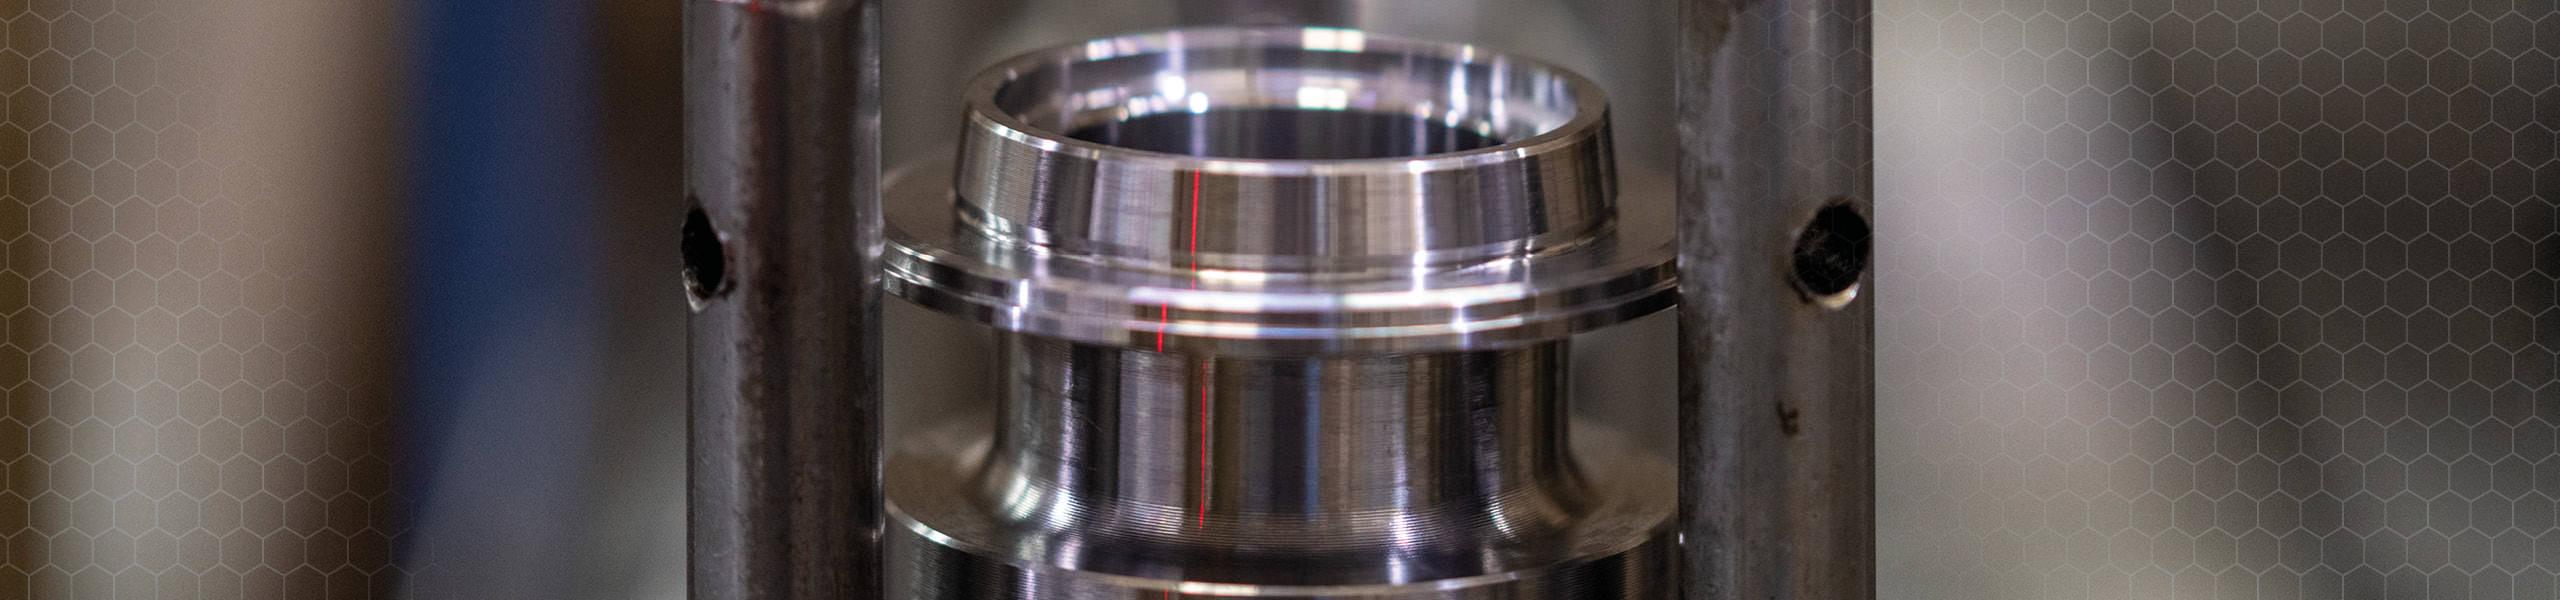 Zeh Präzisionsteile Produkte: CNC - Drehteile Frästeile